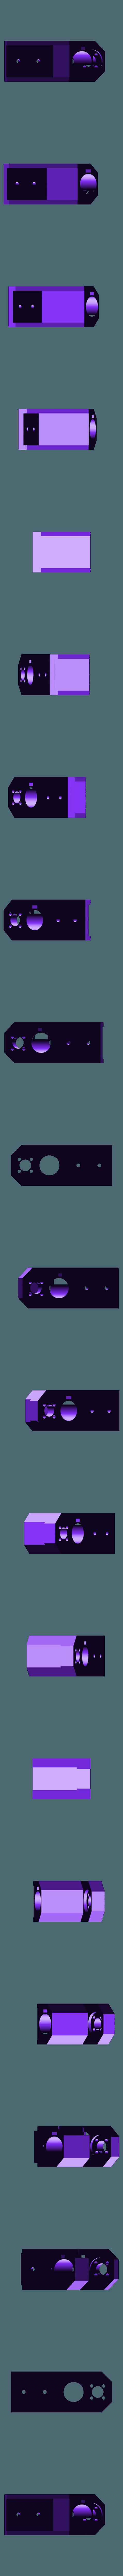 Z_axis_spindle_nut_bracket2.stl Download free STL file FDM Printer de Kleine Reus 300x300x900 • 3D printable object, Job